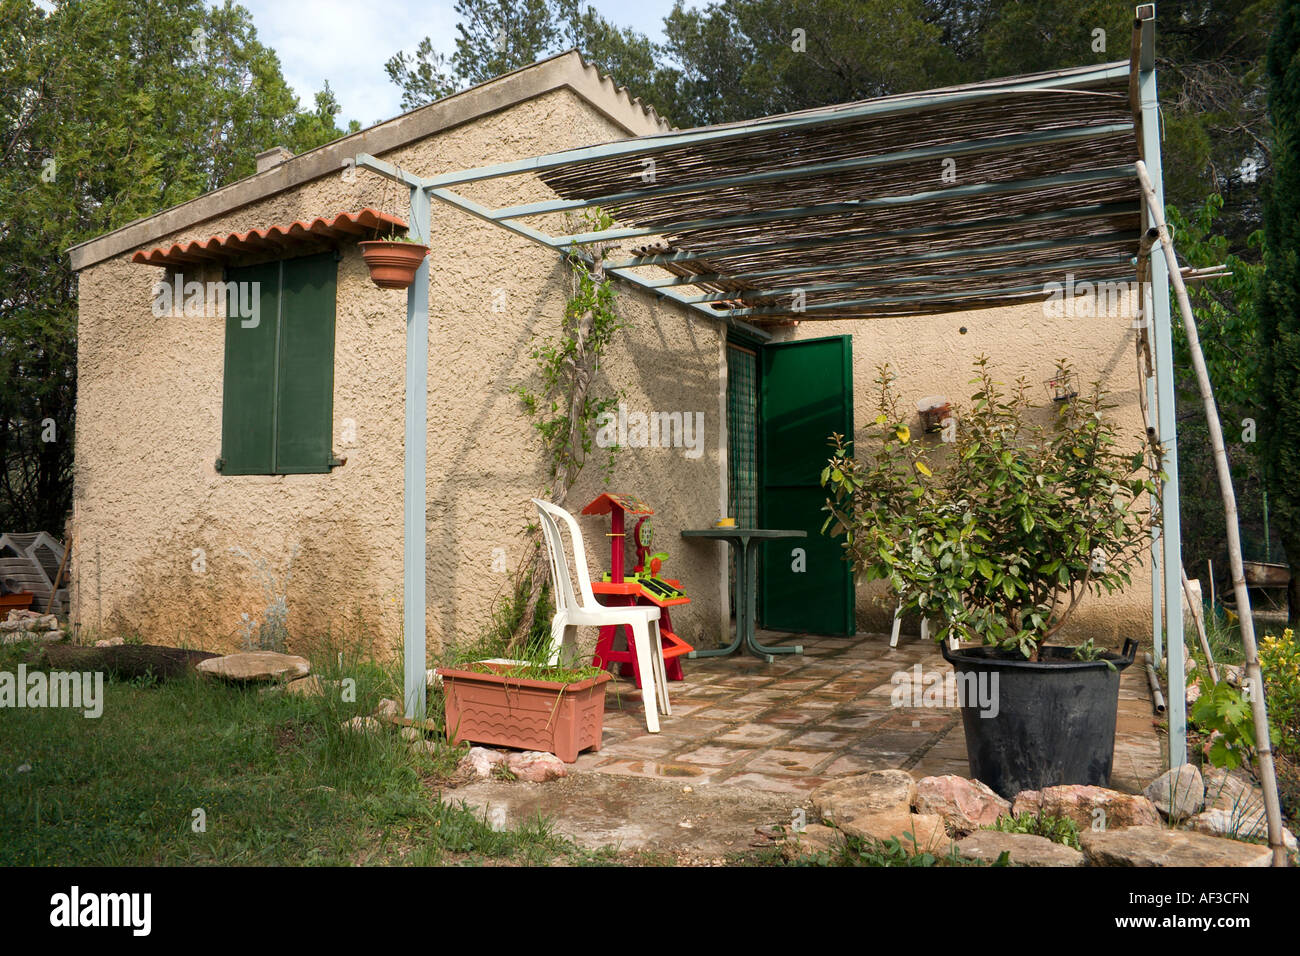 kleines landhaus in provence frankreich stockfoto bild 13818296 alamy. Black Bedroom Furniture Sets. Home Design Ideas